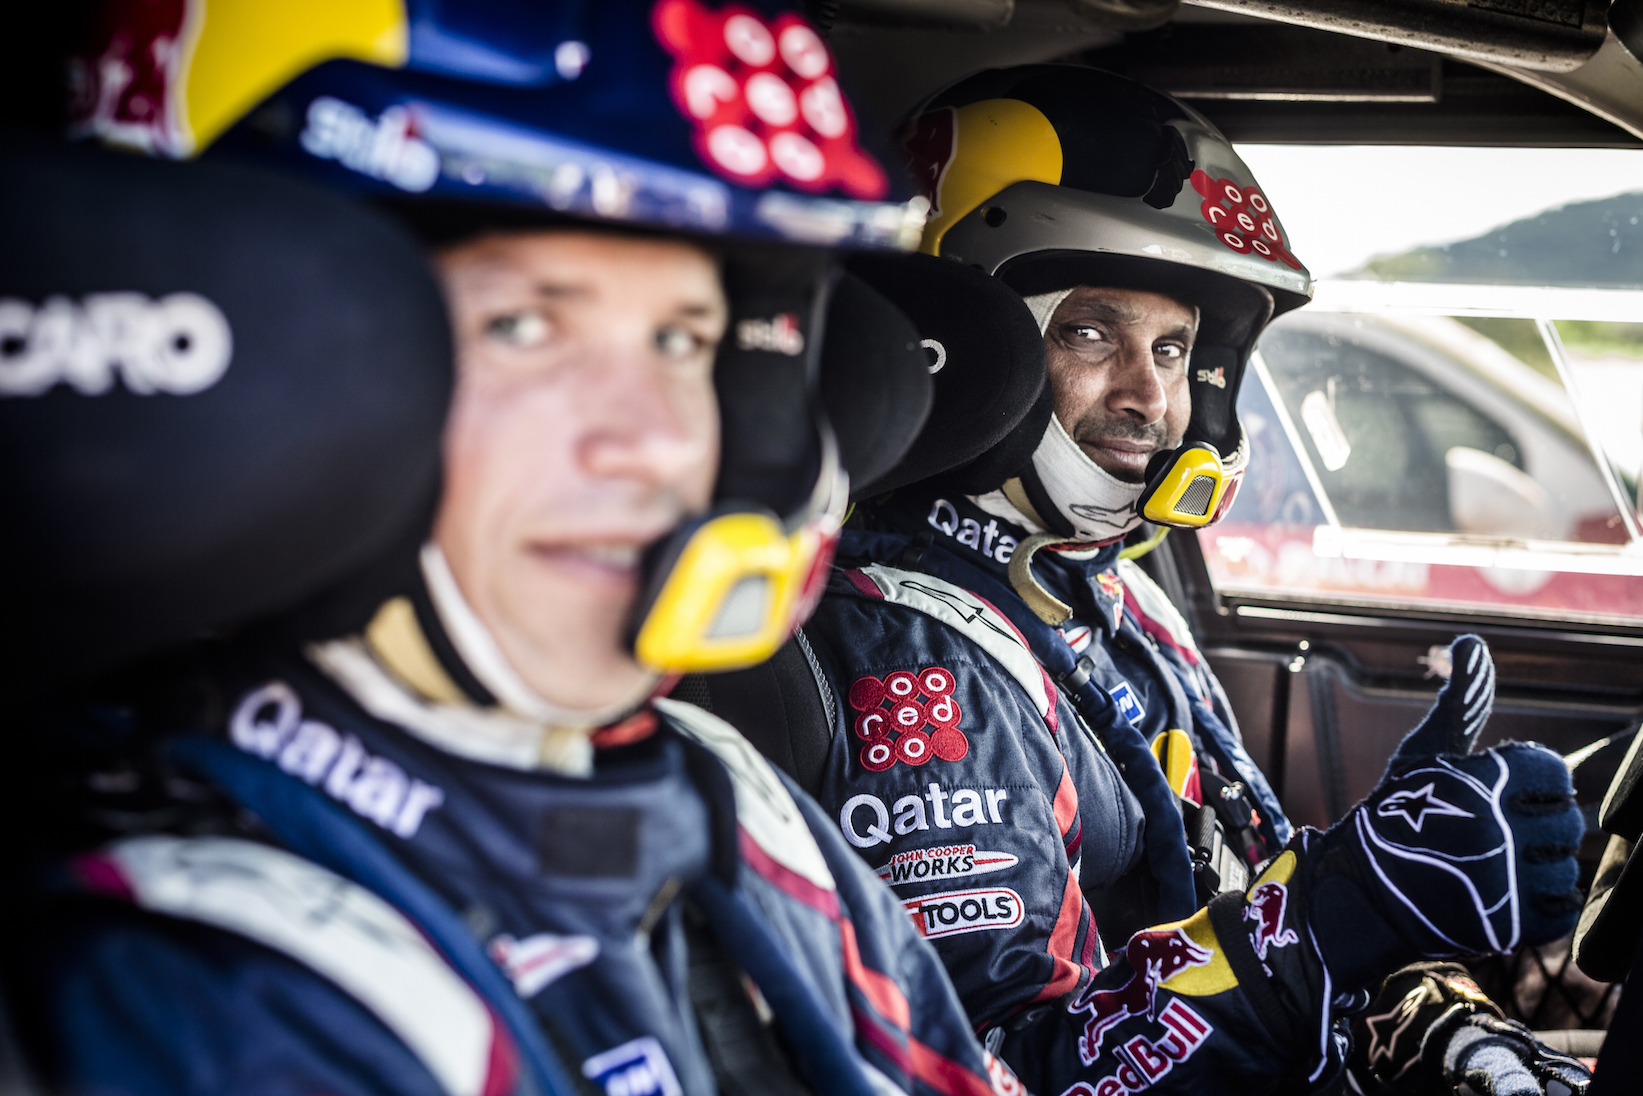 Al doilea titlu Dakar pentru Nasser Al-Attiyah